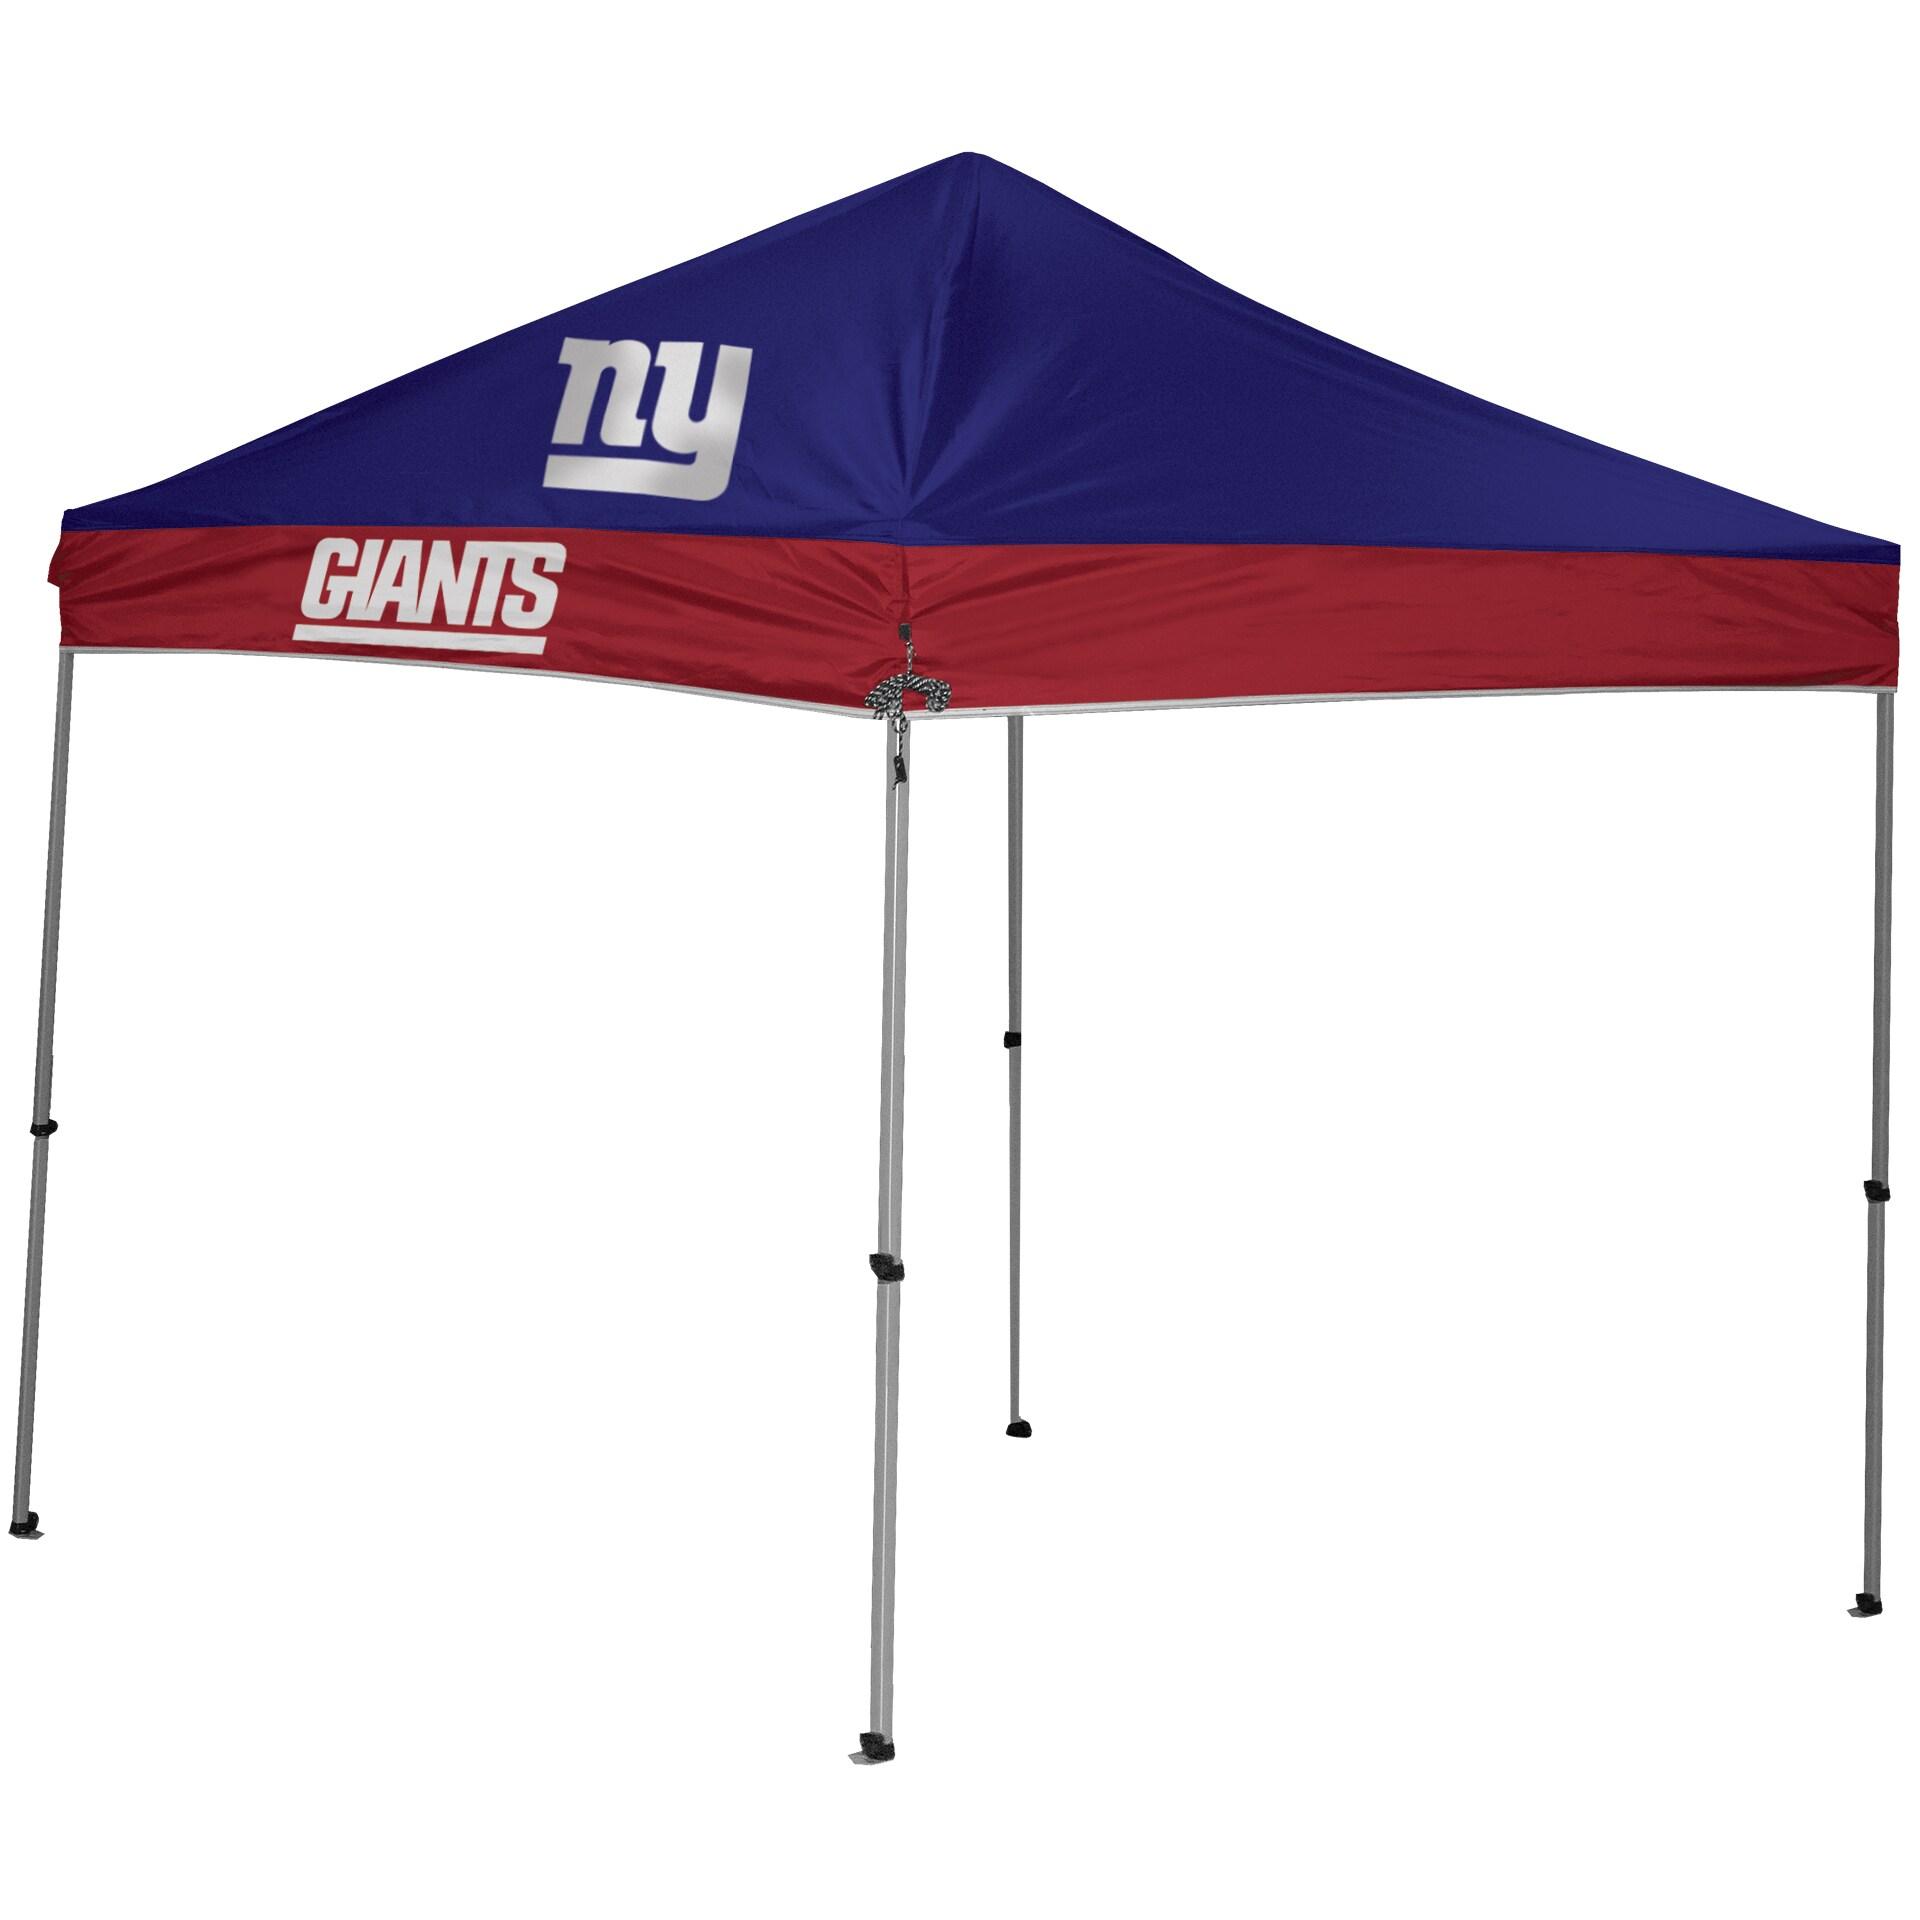 New York Giants 9' x 9' 2-Tone Straight Leg Canopy Tent